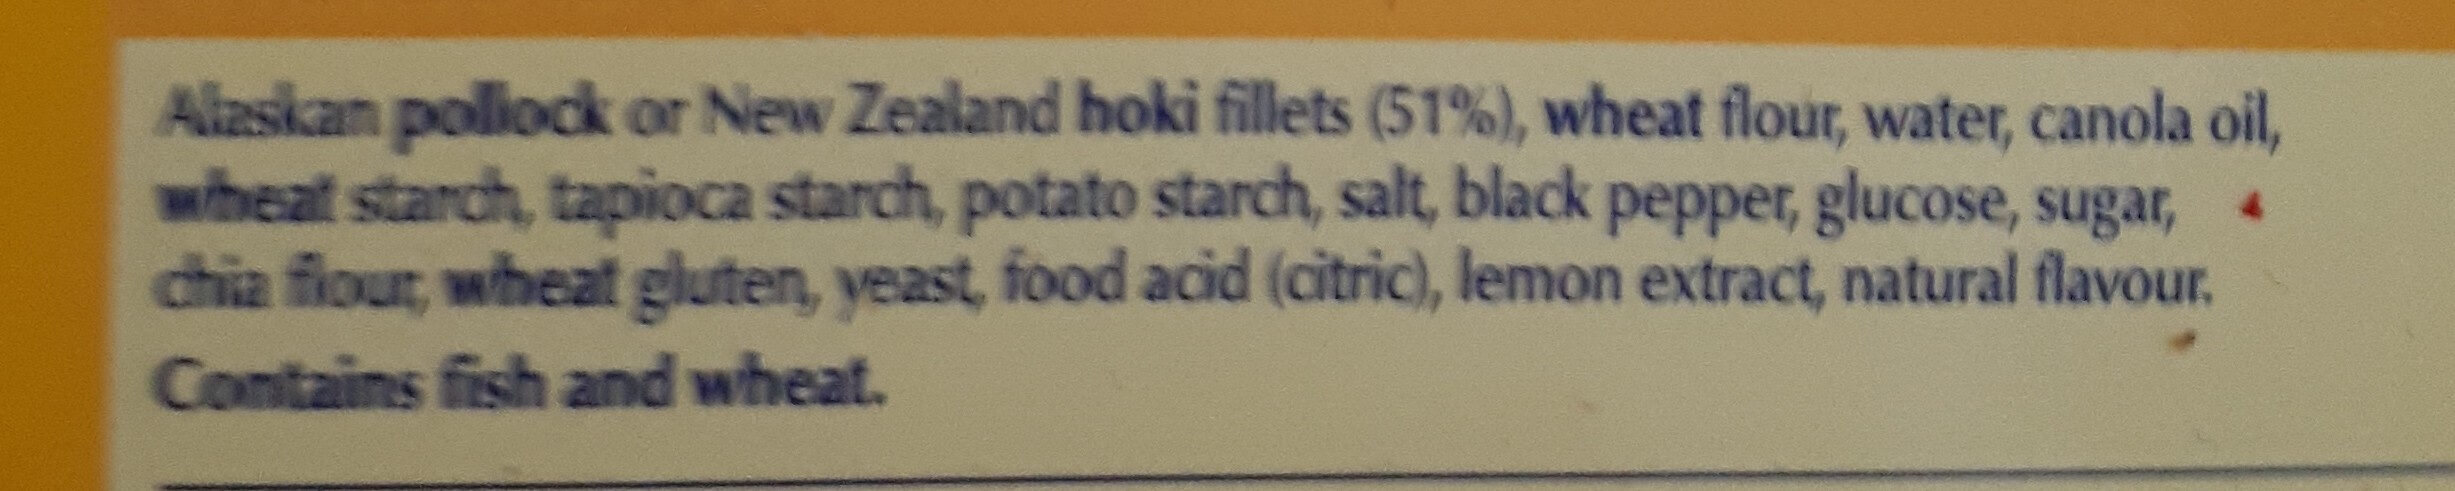 Oven Bake 6 Lemon Pepper Crumb 100% Fish Fillets - Ingredients - en